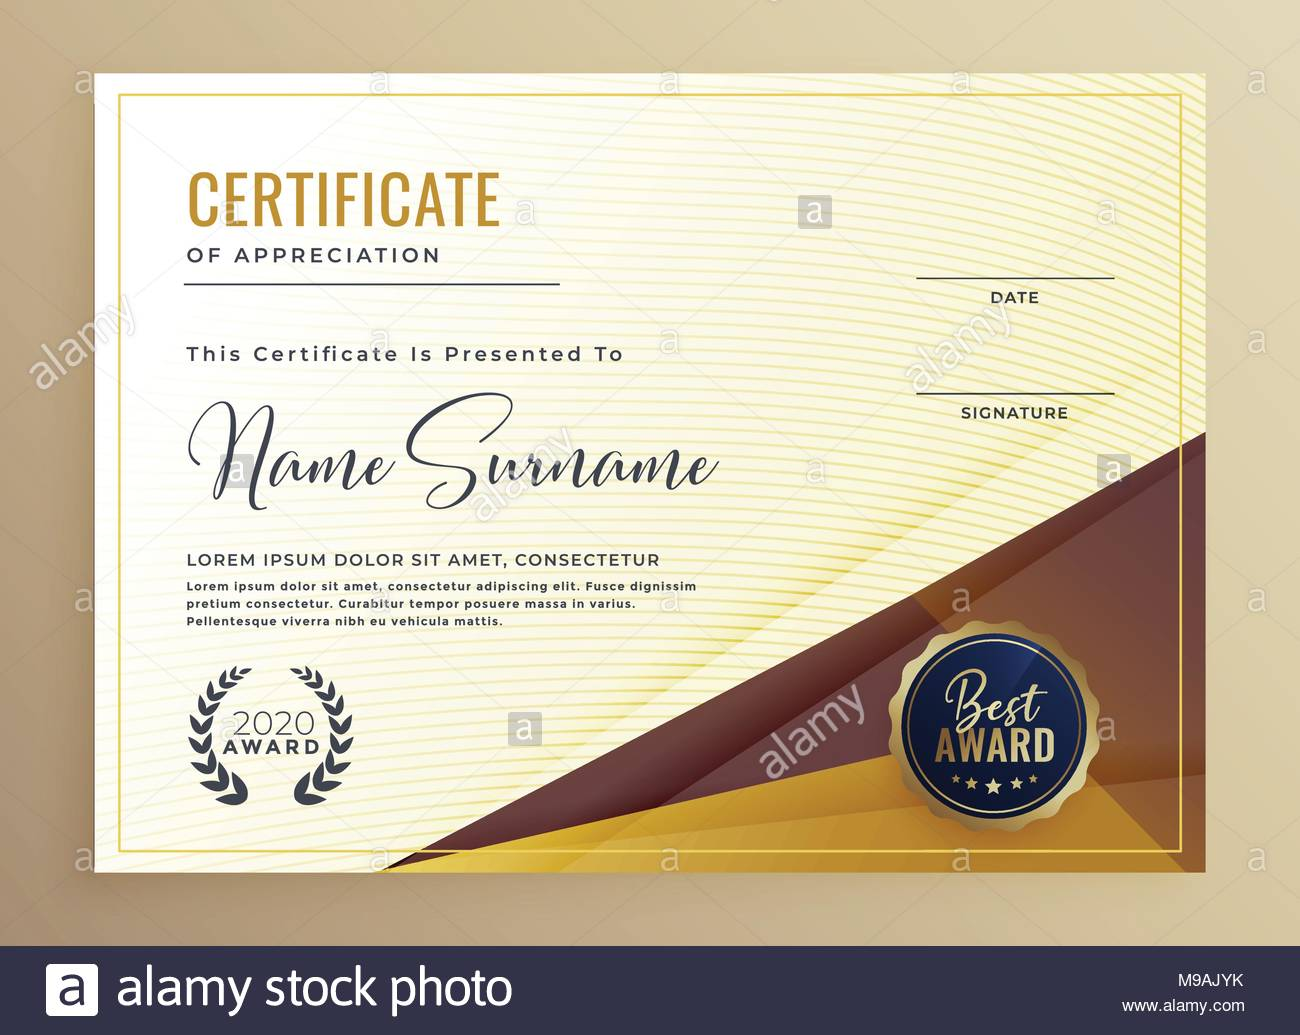 luxury premium certificate design template stock vector art